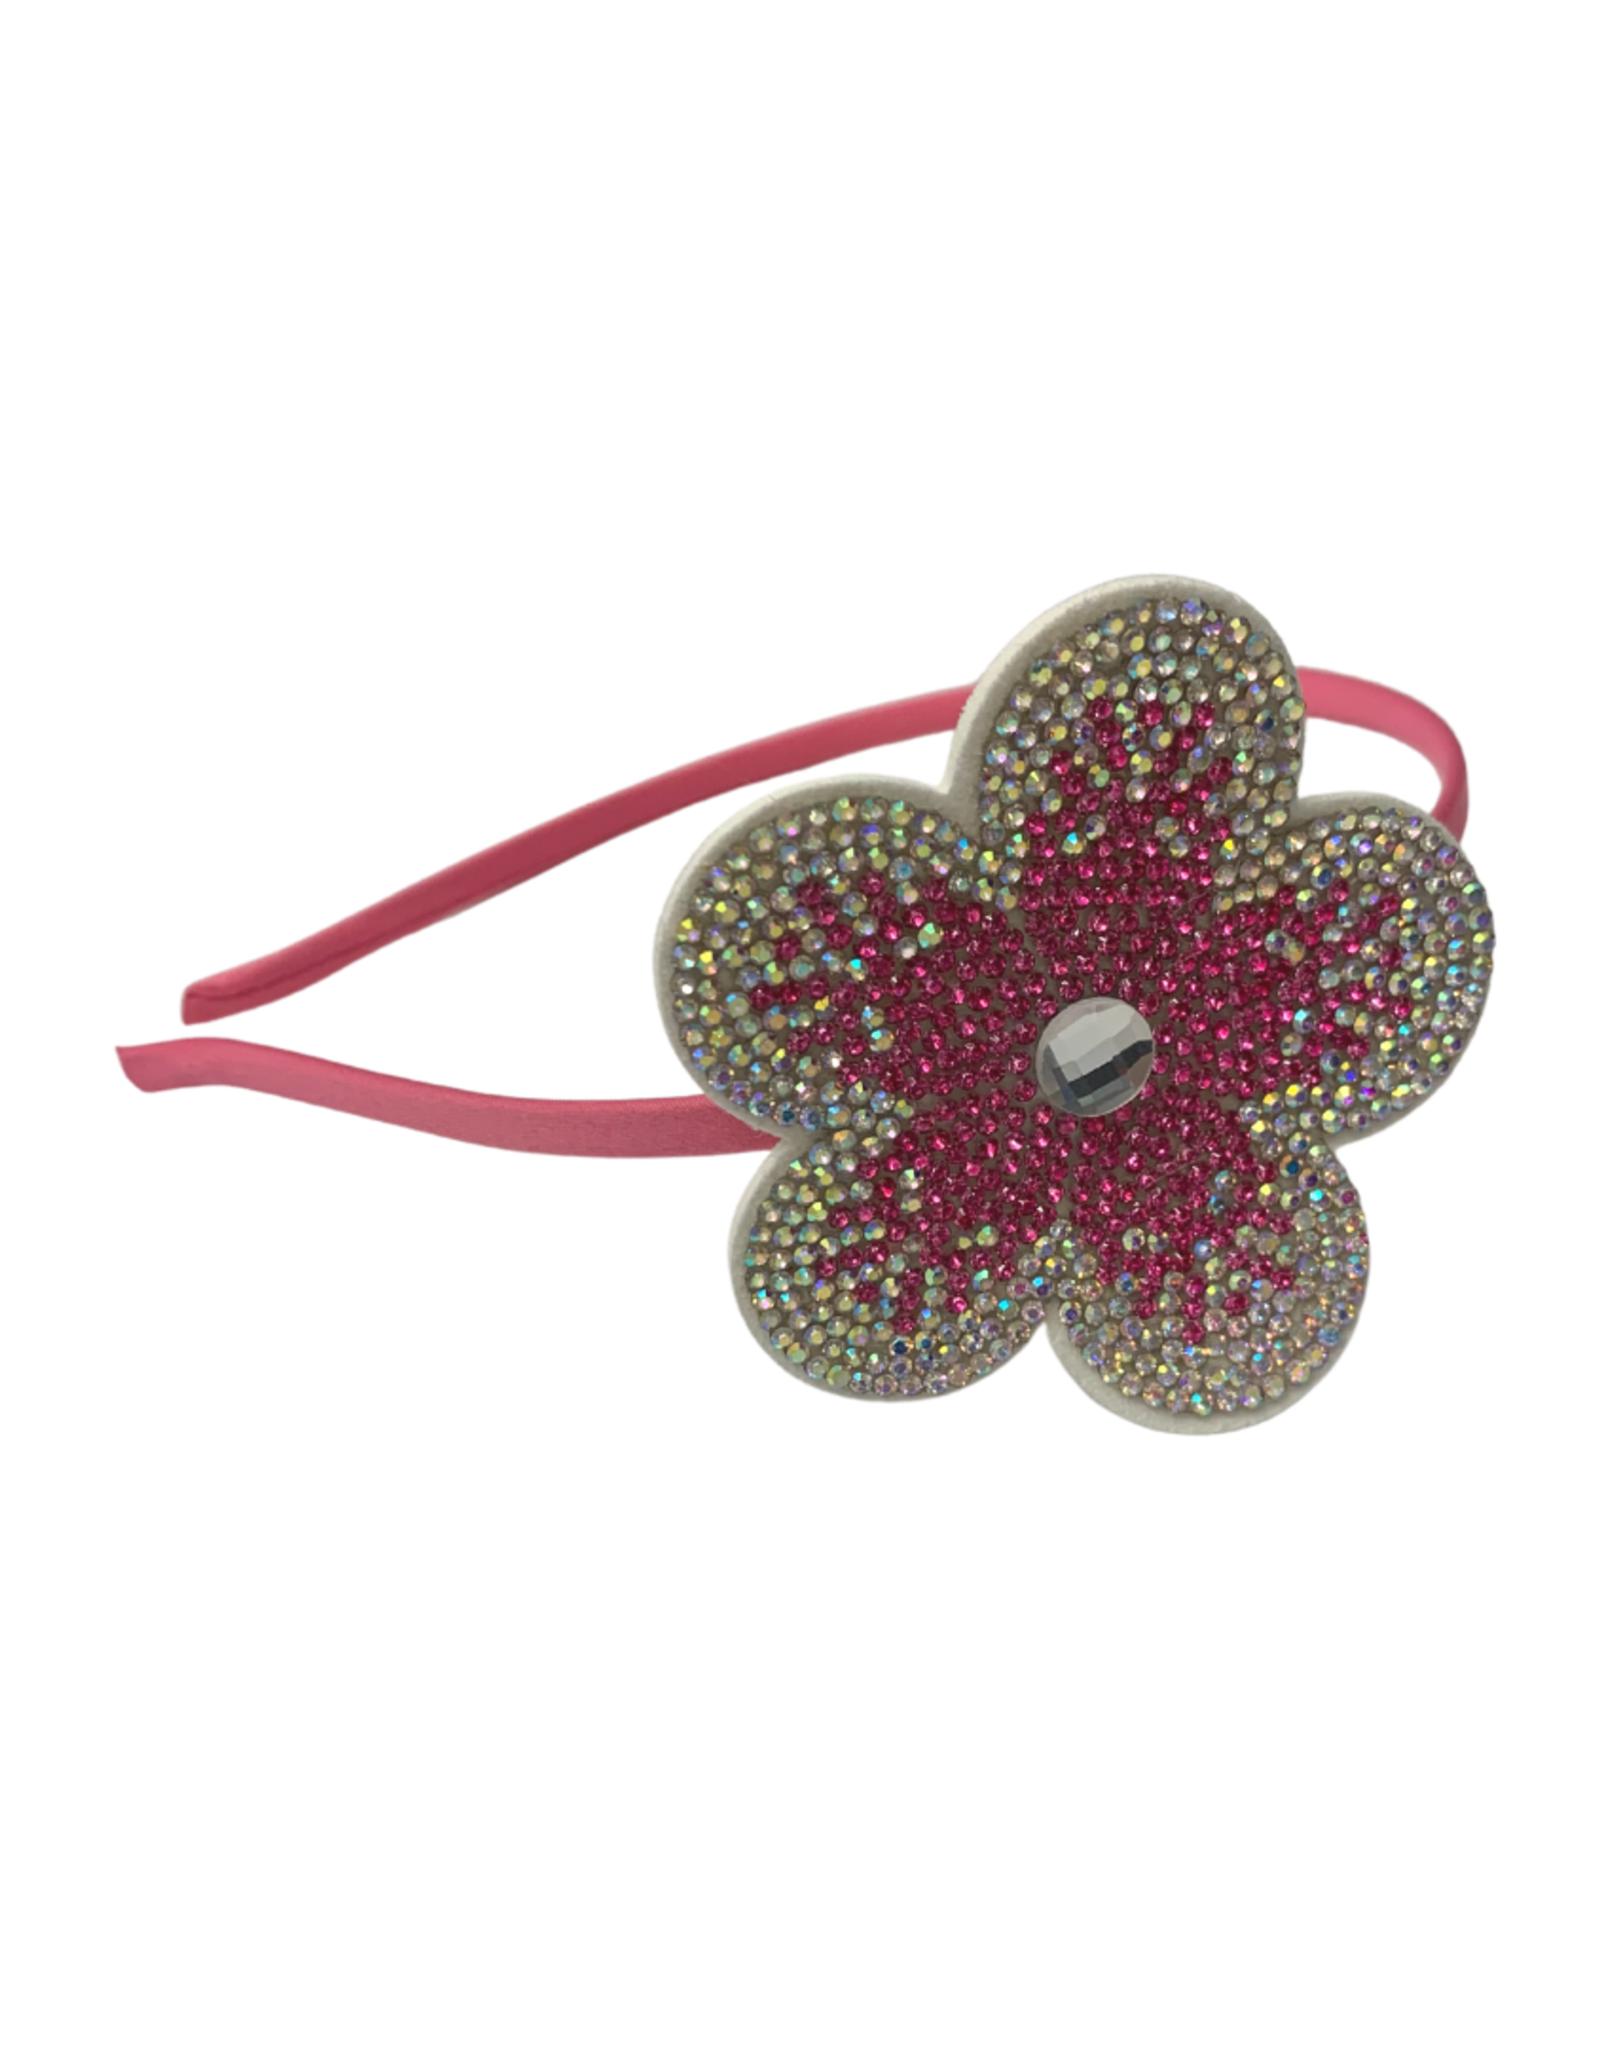 Bows Arts Rhinestone Motif Headband - Flower